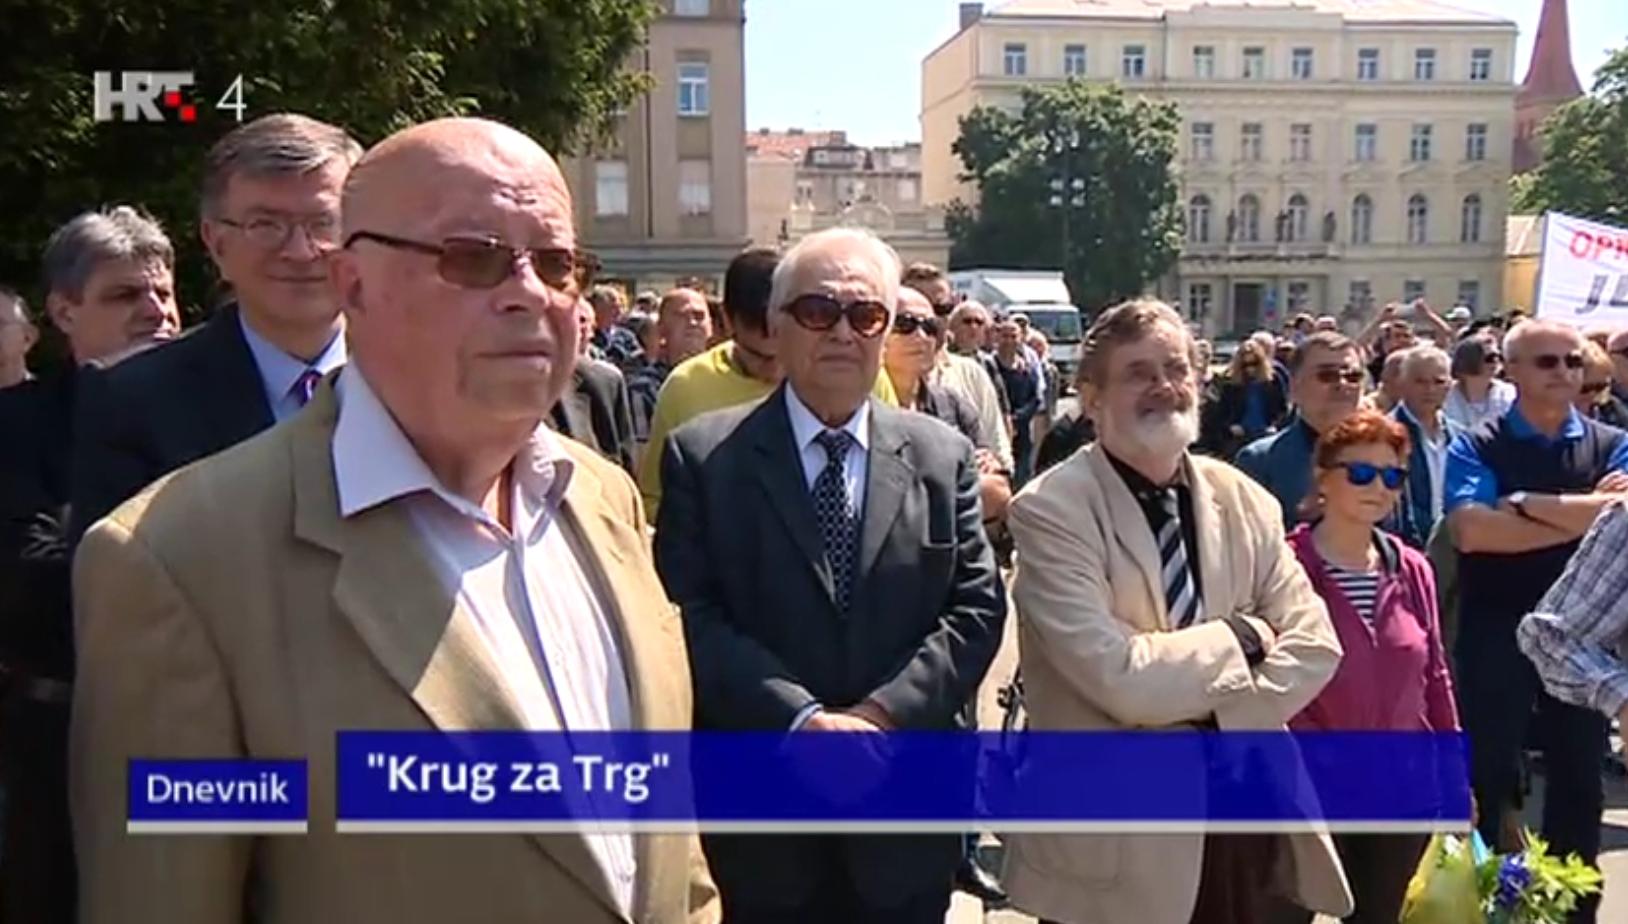 http://hrvatskifokus-2021.ga/wp-content/uploads/2016/05/Krug-za-trg-zdravko-tomac-josip-pecaric.jpg